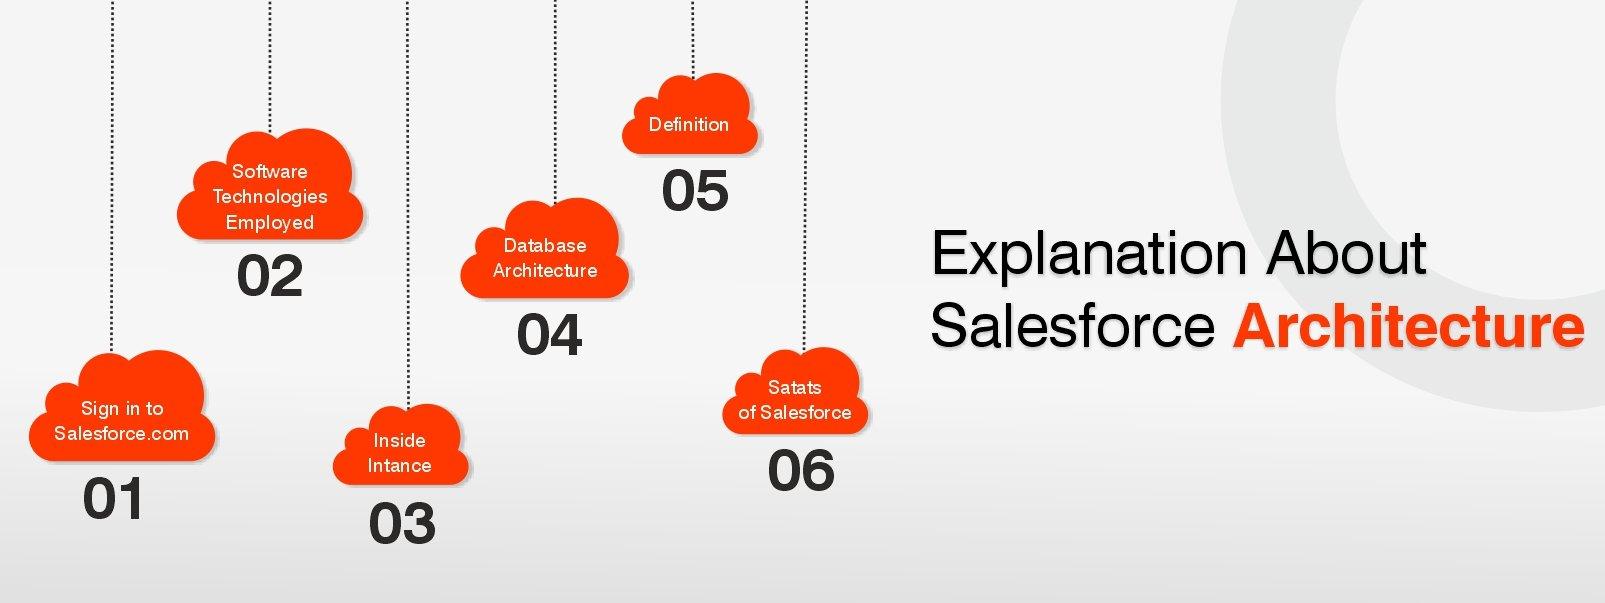 Explanation About Salesforce Architecture